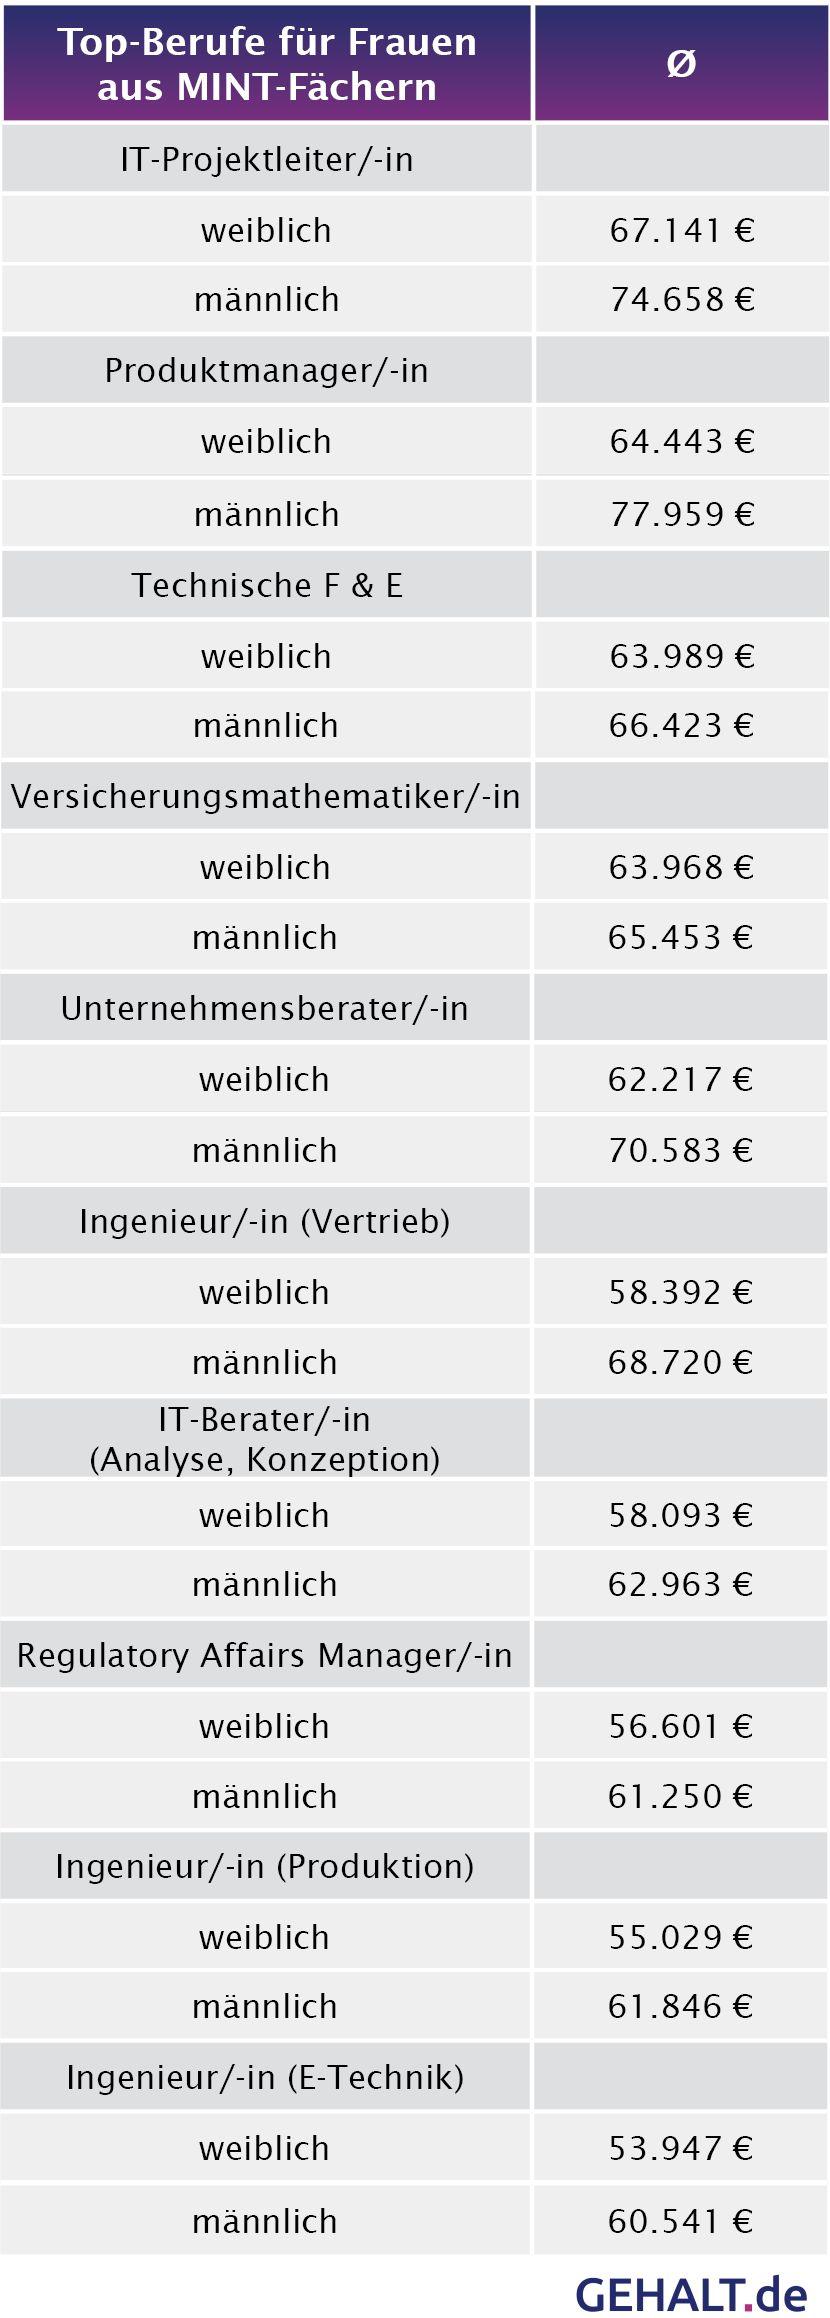 Gehaltsvergleich Männer/Frauen aus MINT-Fächern. Grafik: gehalt.de